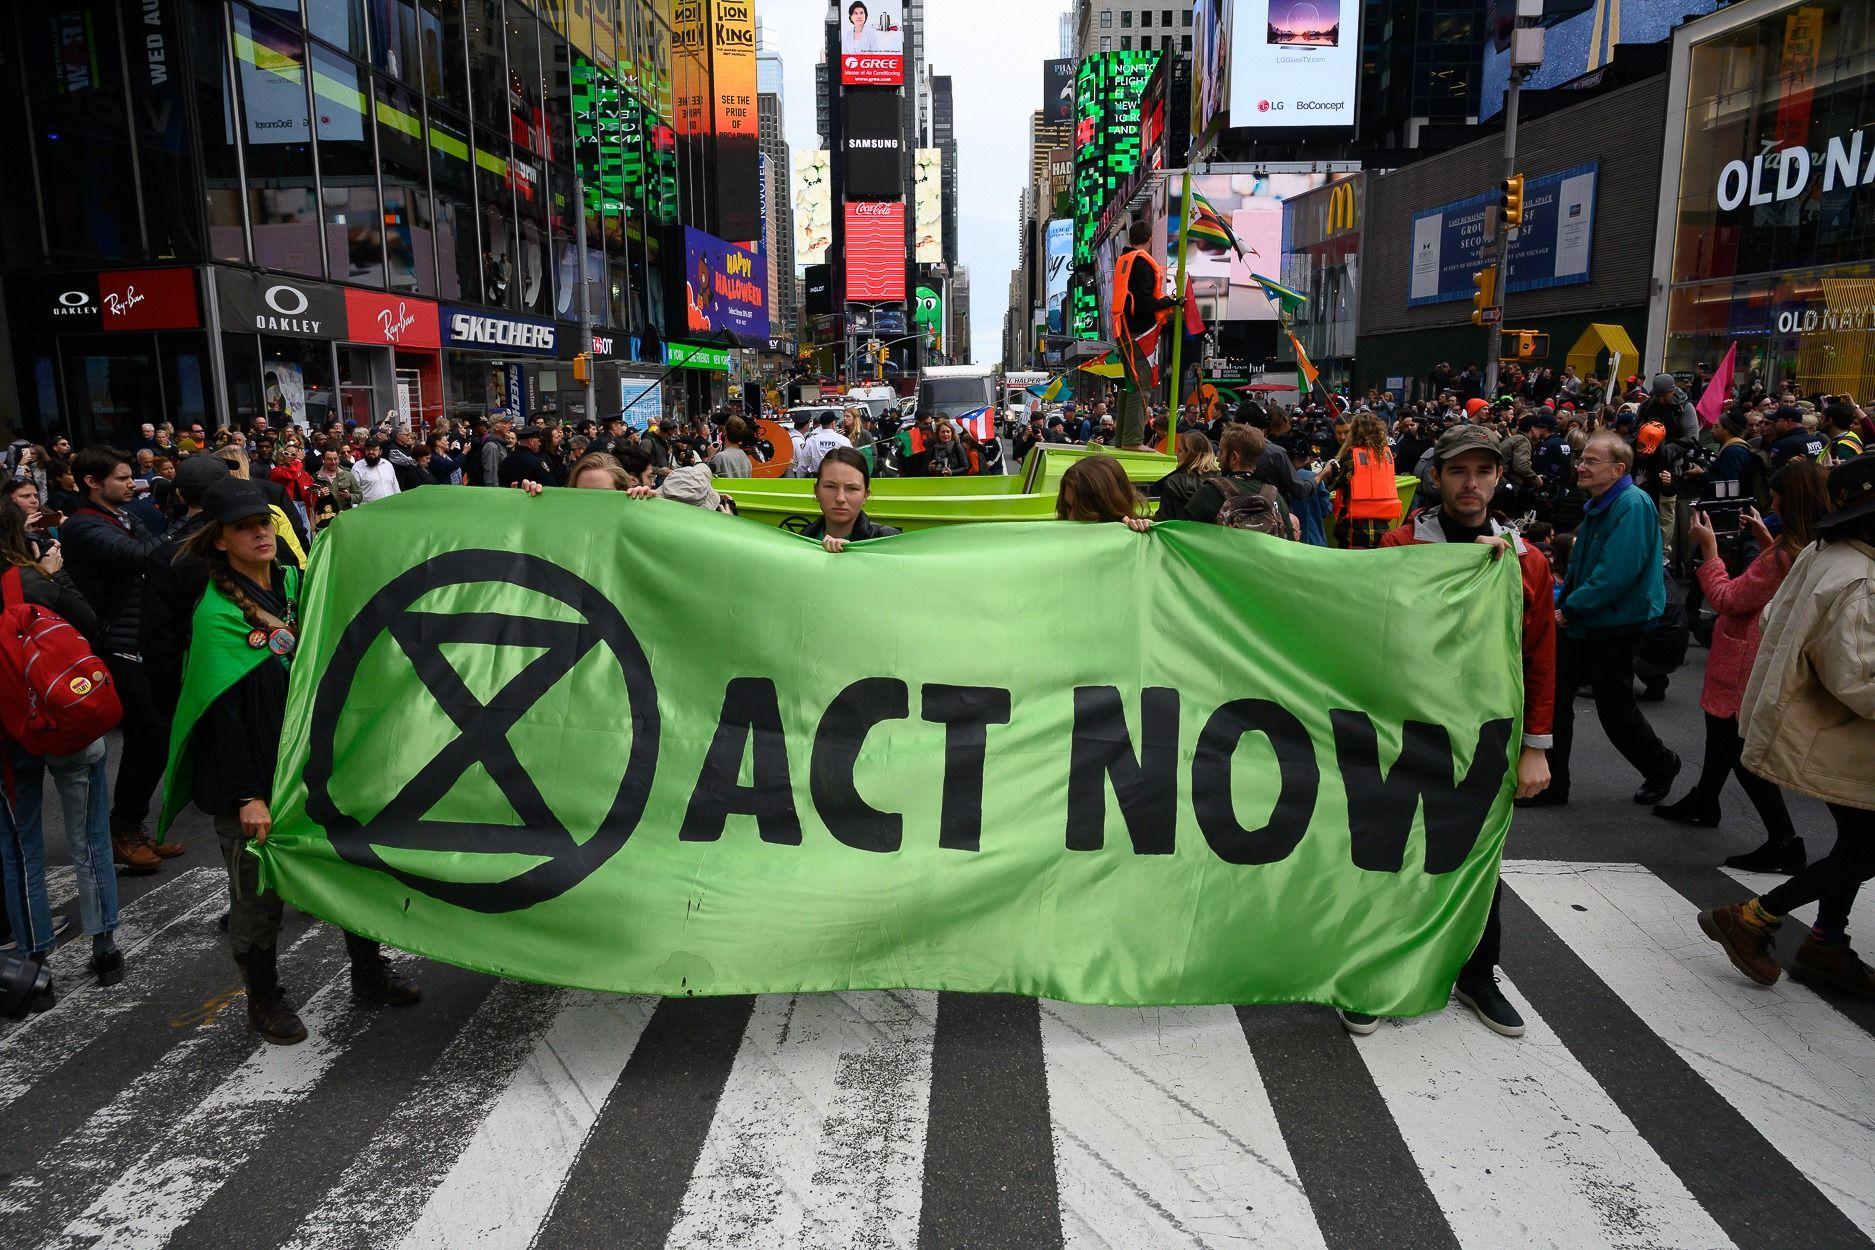 Changemaker Spotlight: Q&A With Extinction Rebellion's Tom Hoy